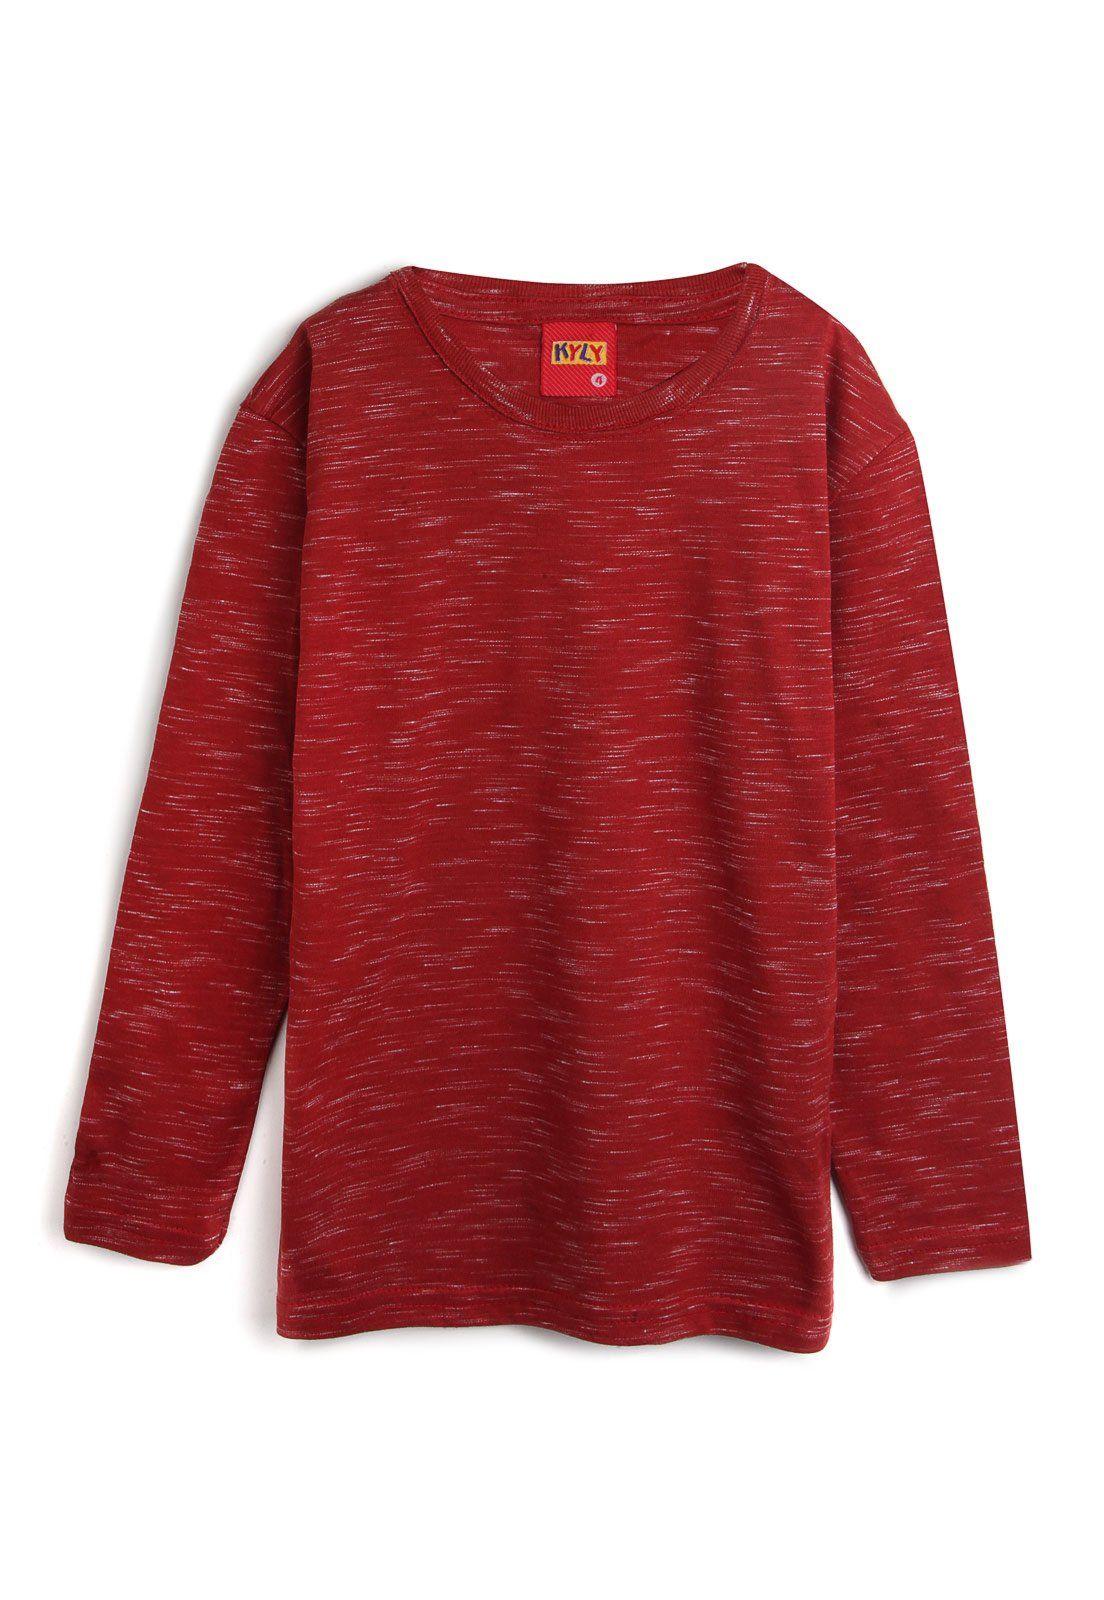 Camiseta Meia Malha Manga Longa Vermelho Kyly